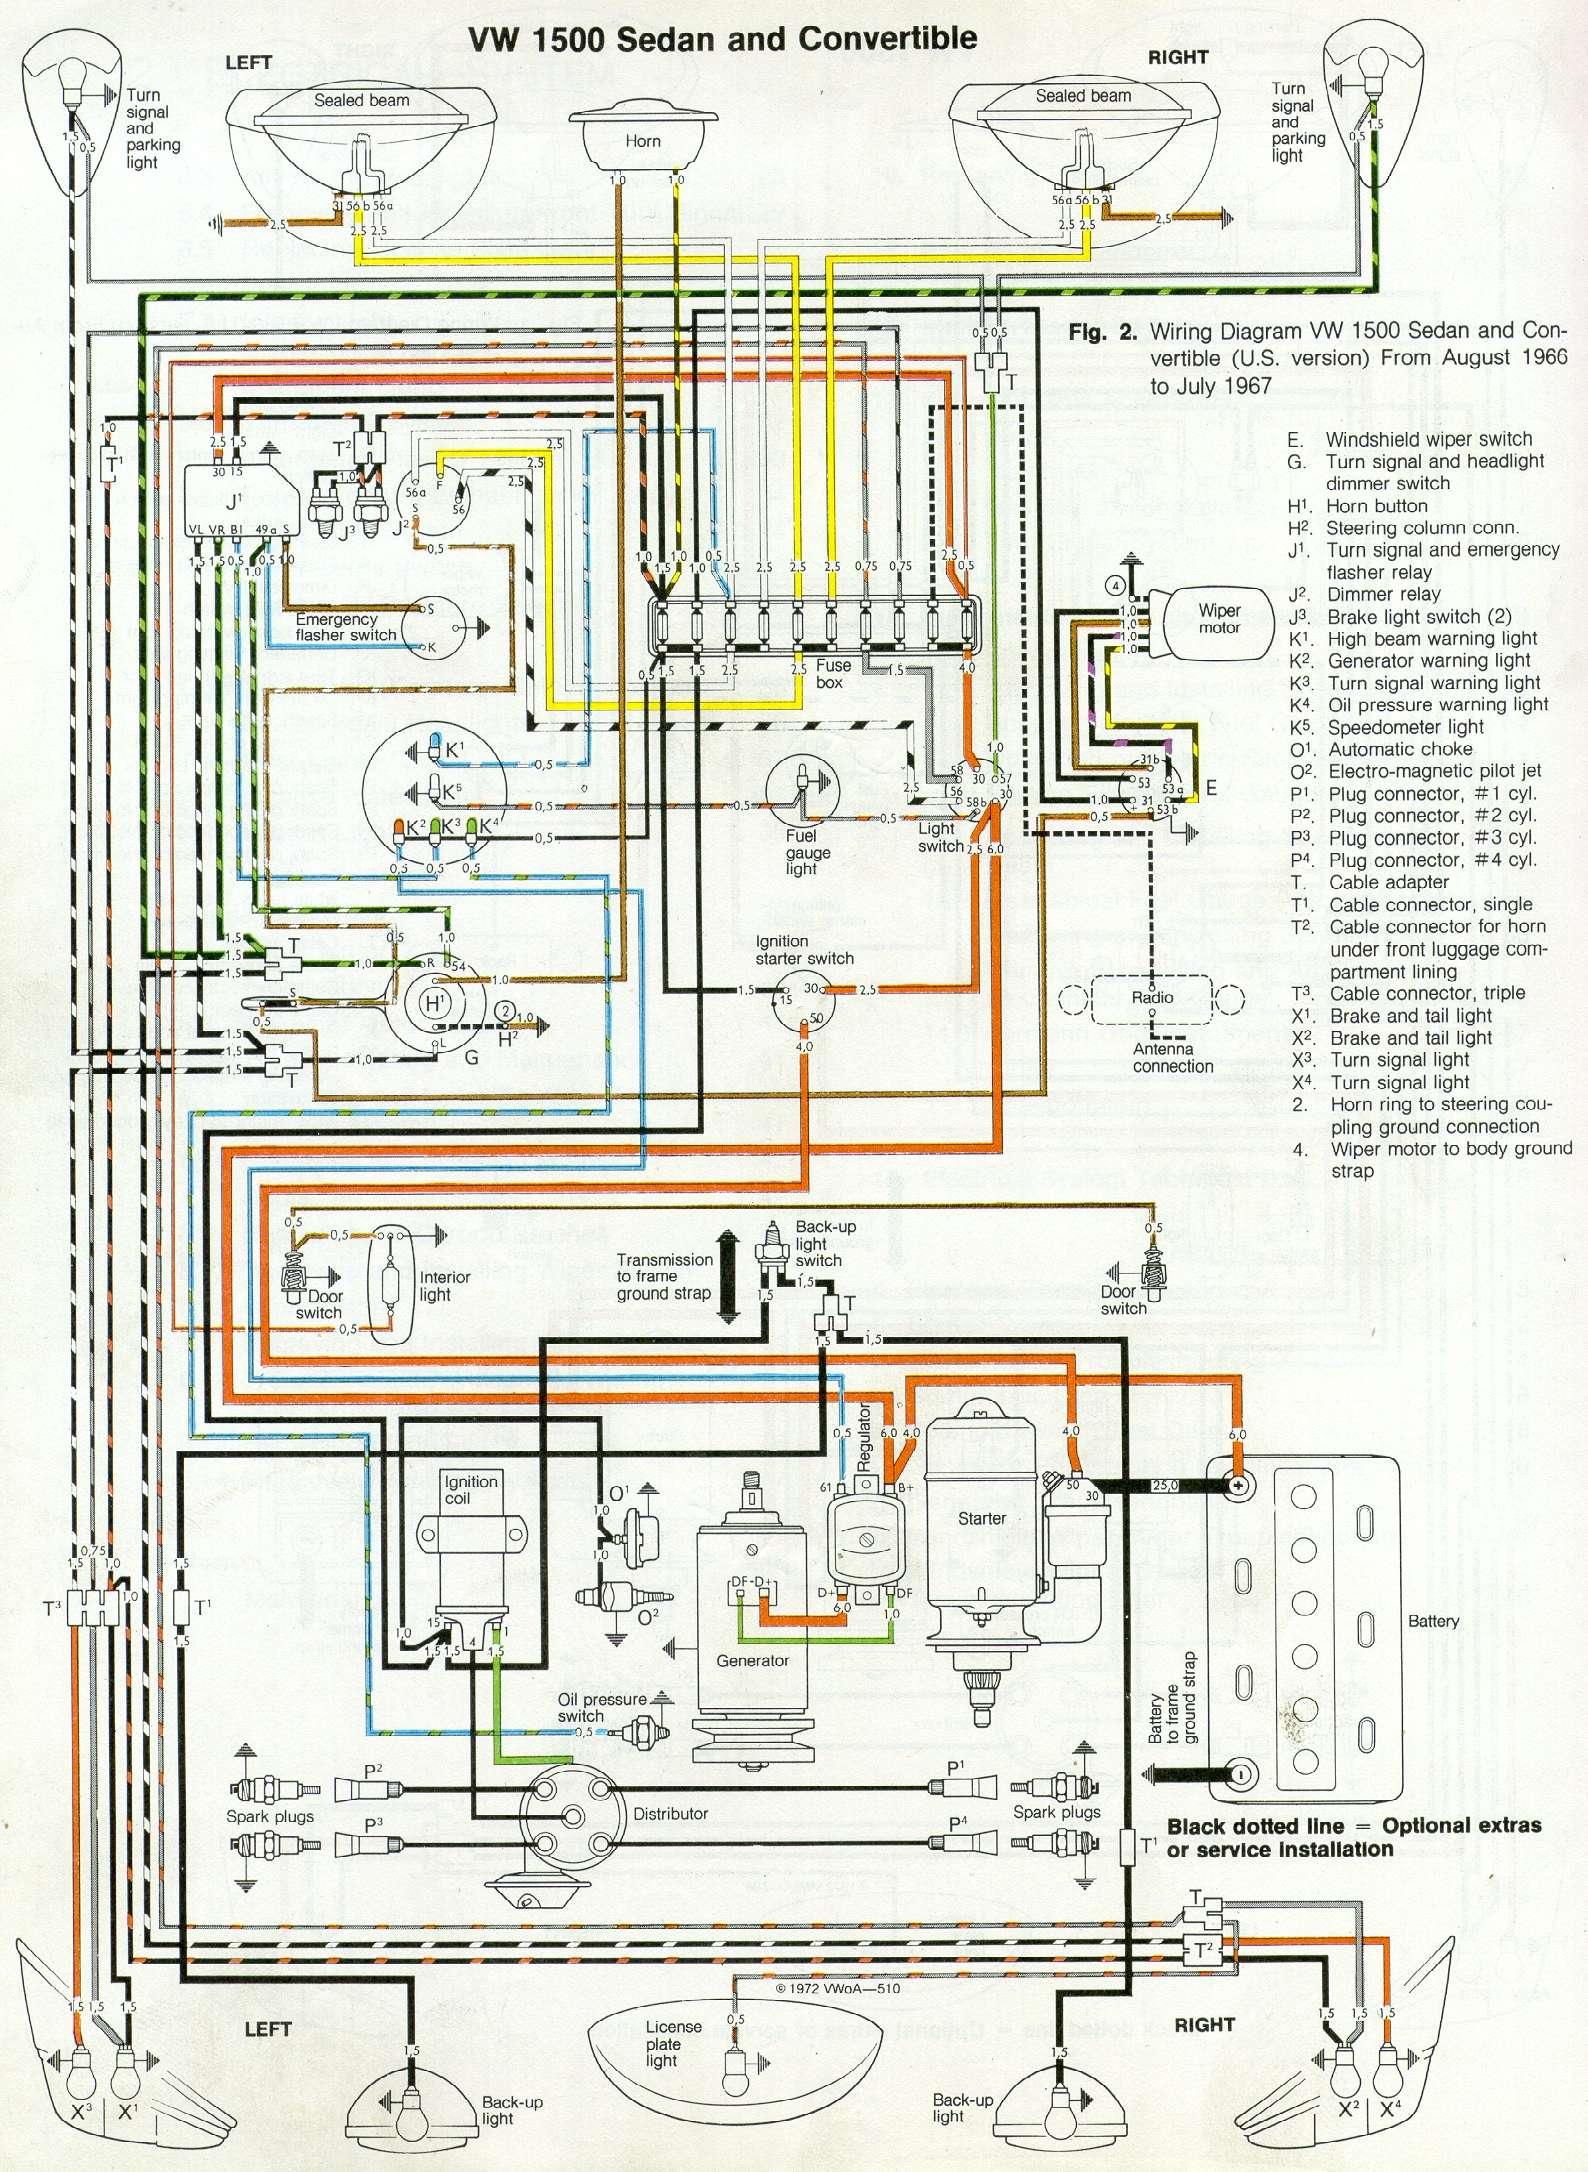 Terrific 67 Beetle Flasher Relay Wiring Diagram Basic Electronics Wiring Wiring Digital Resources Instshebarightsorg